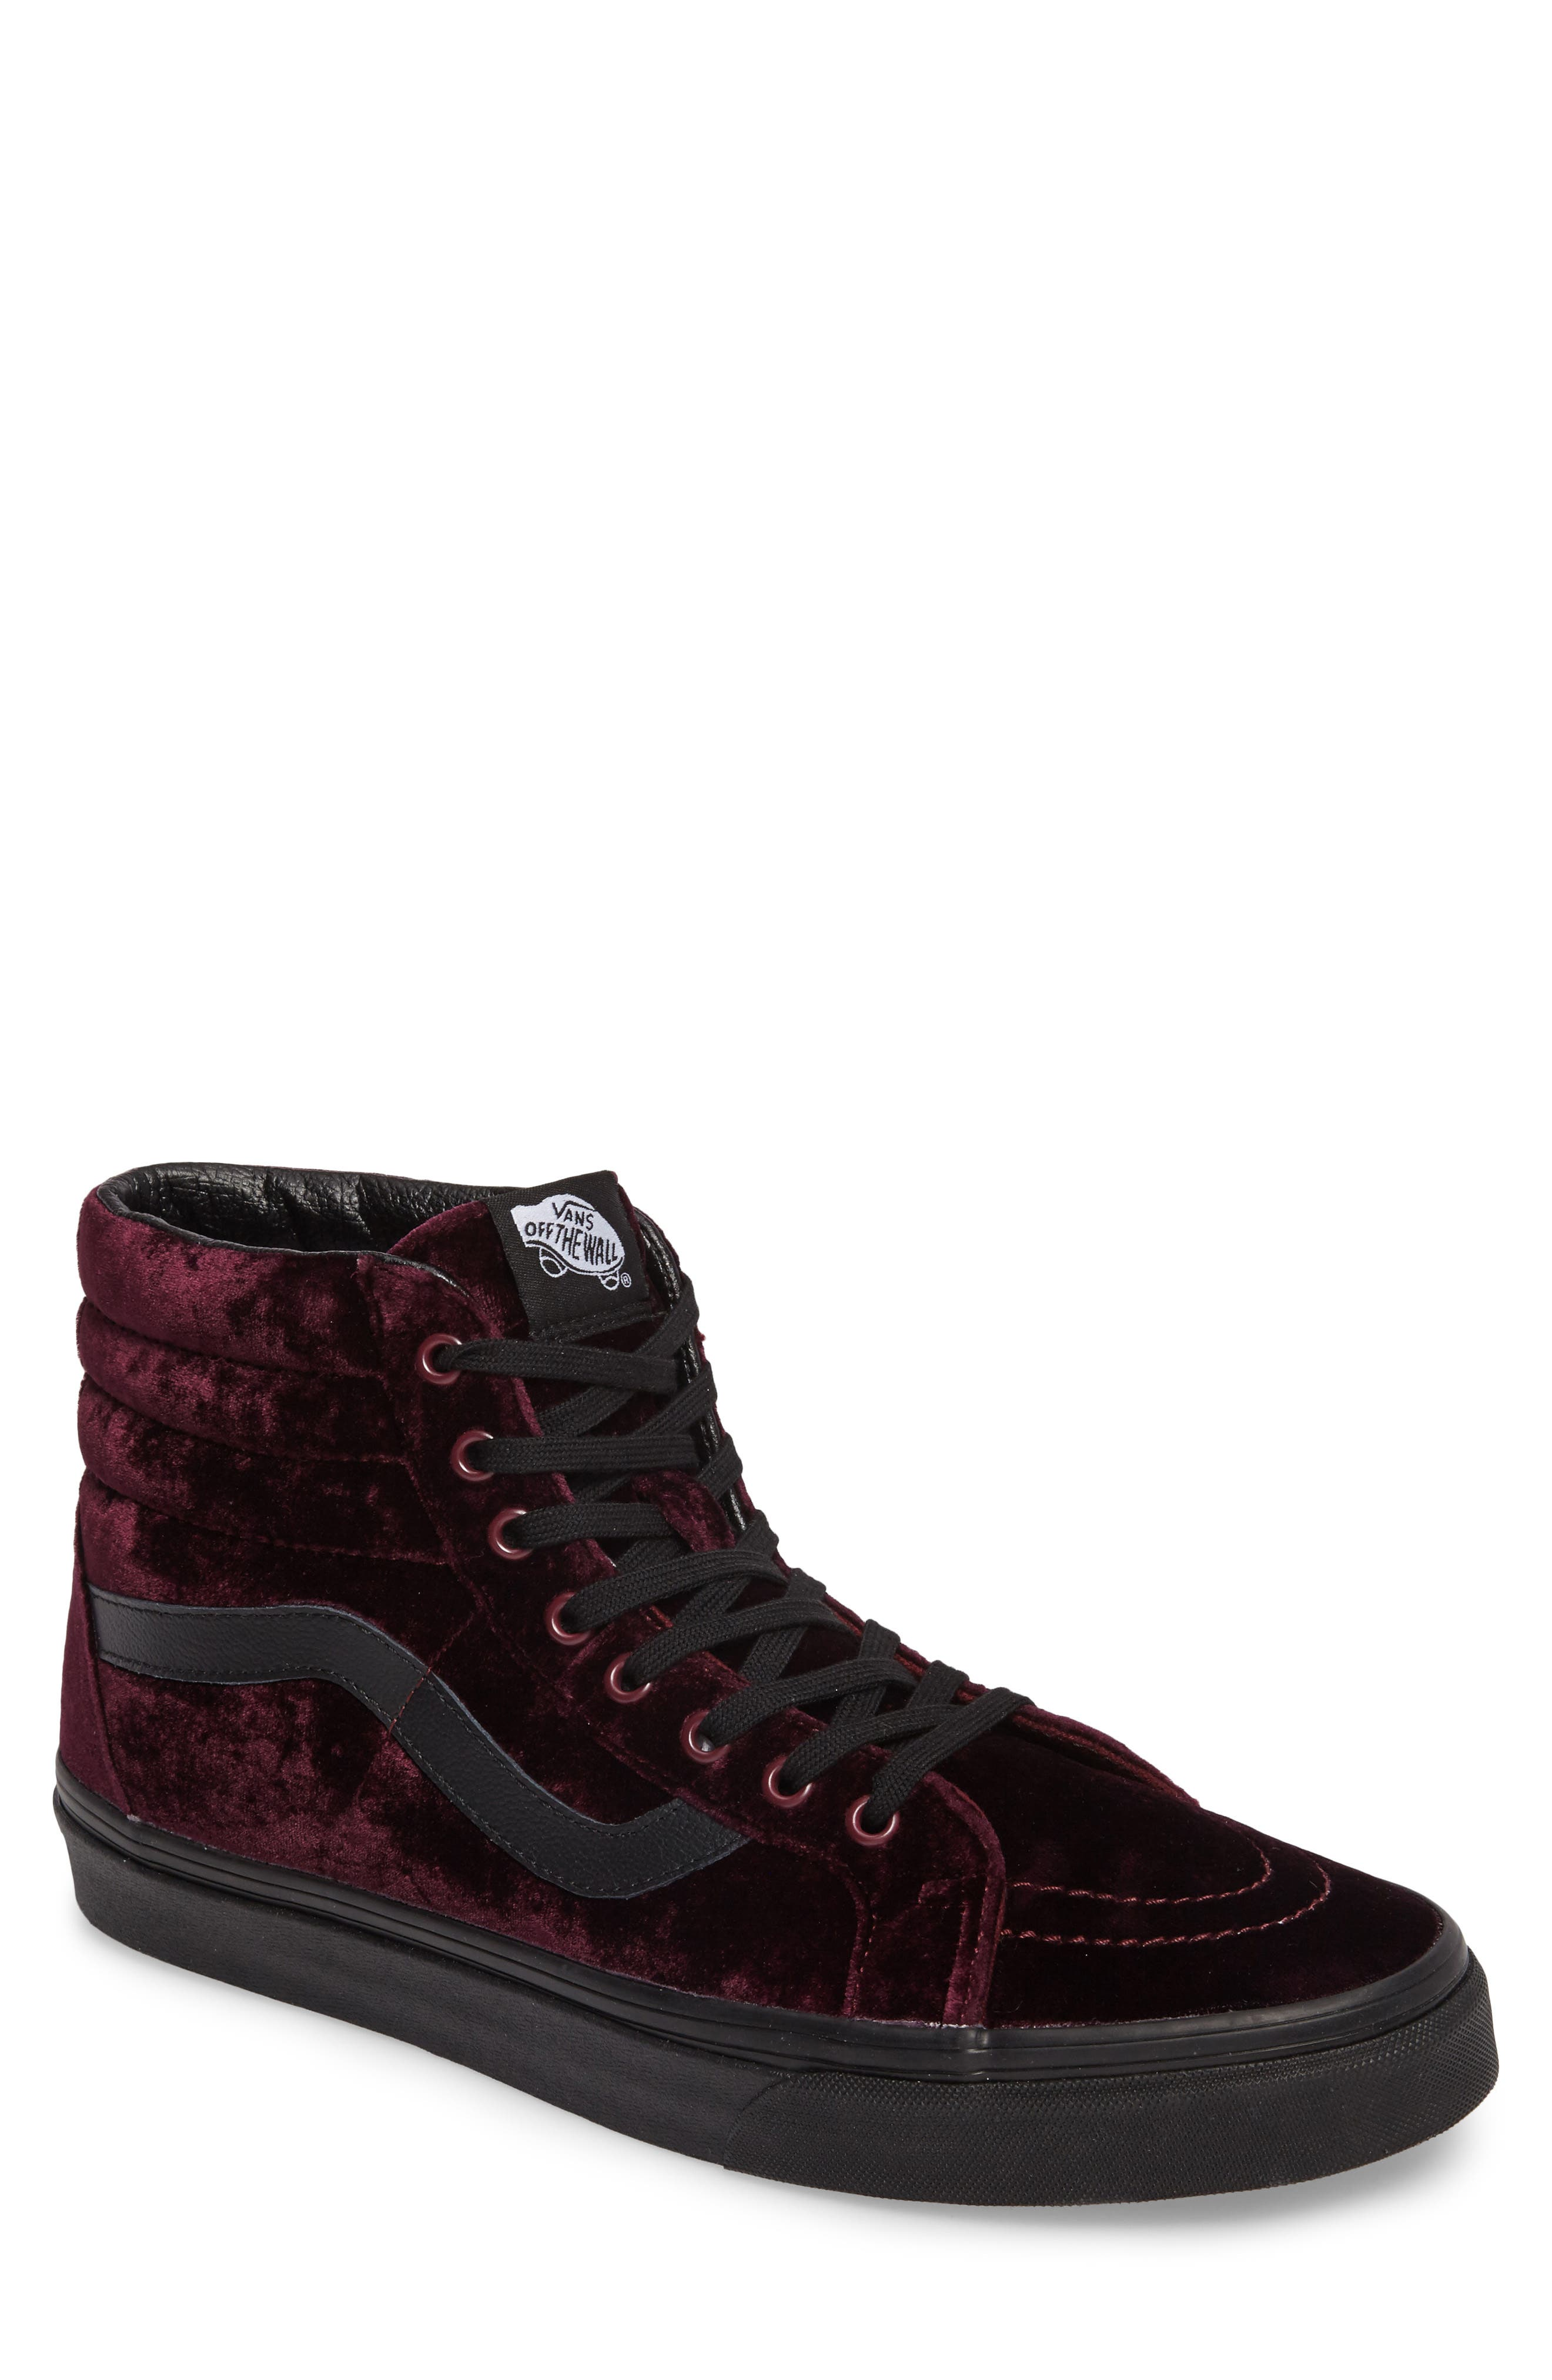 SK8-Hi Reissue High Top Sneaker,                         Main,                         color, 930